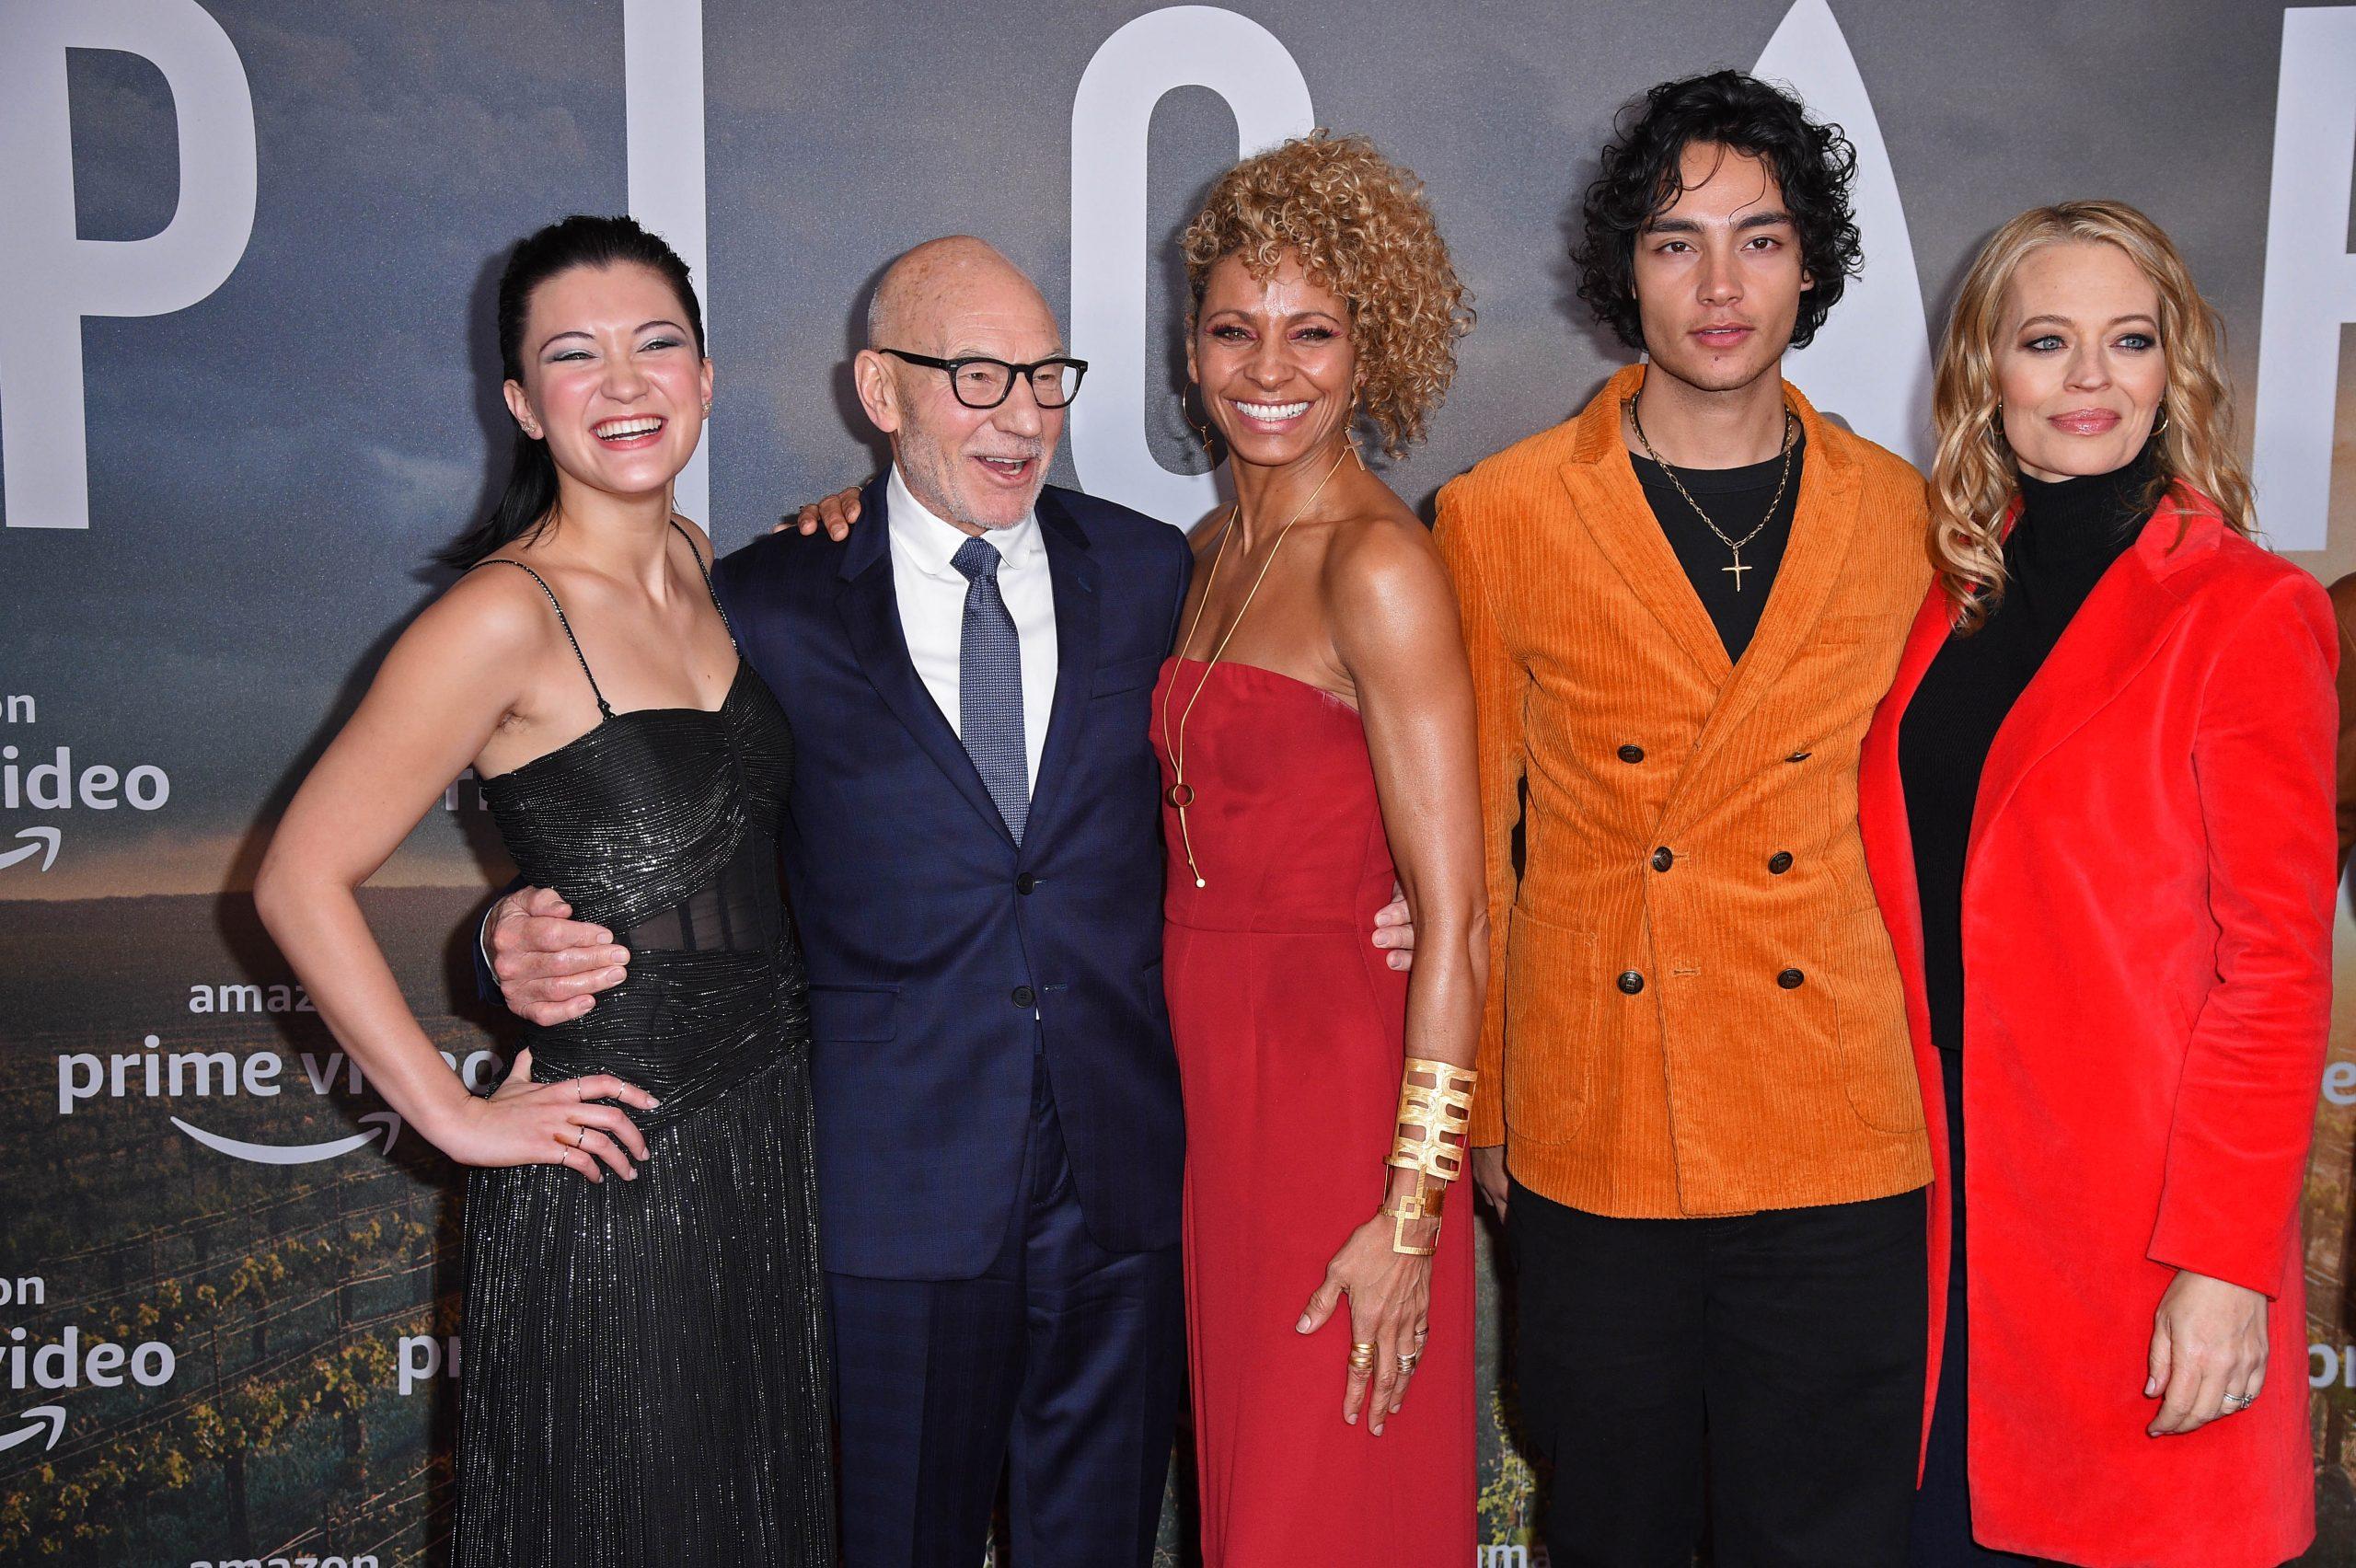 Isa Briones, Sir Patrick Stewart, Michelle Hurd, Evan Evagora, and Jeri Ryan of Star Trek